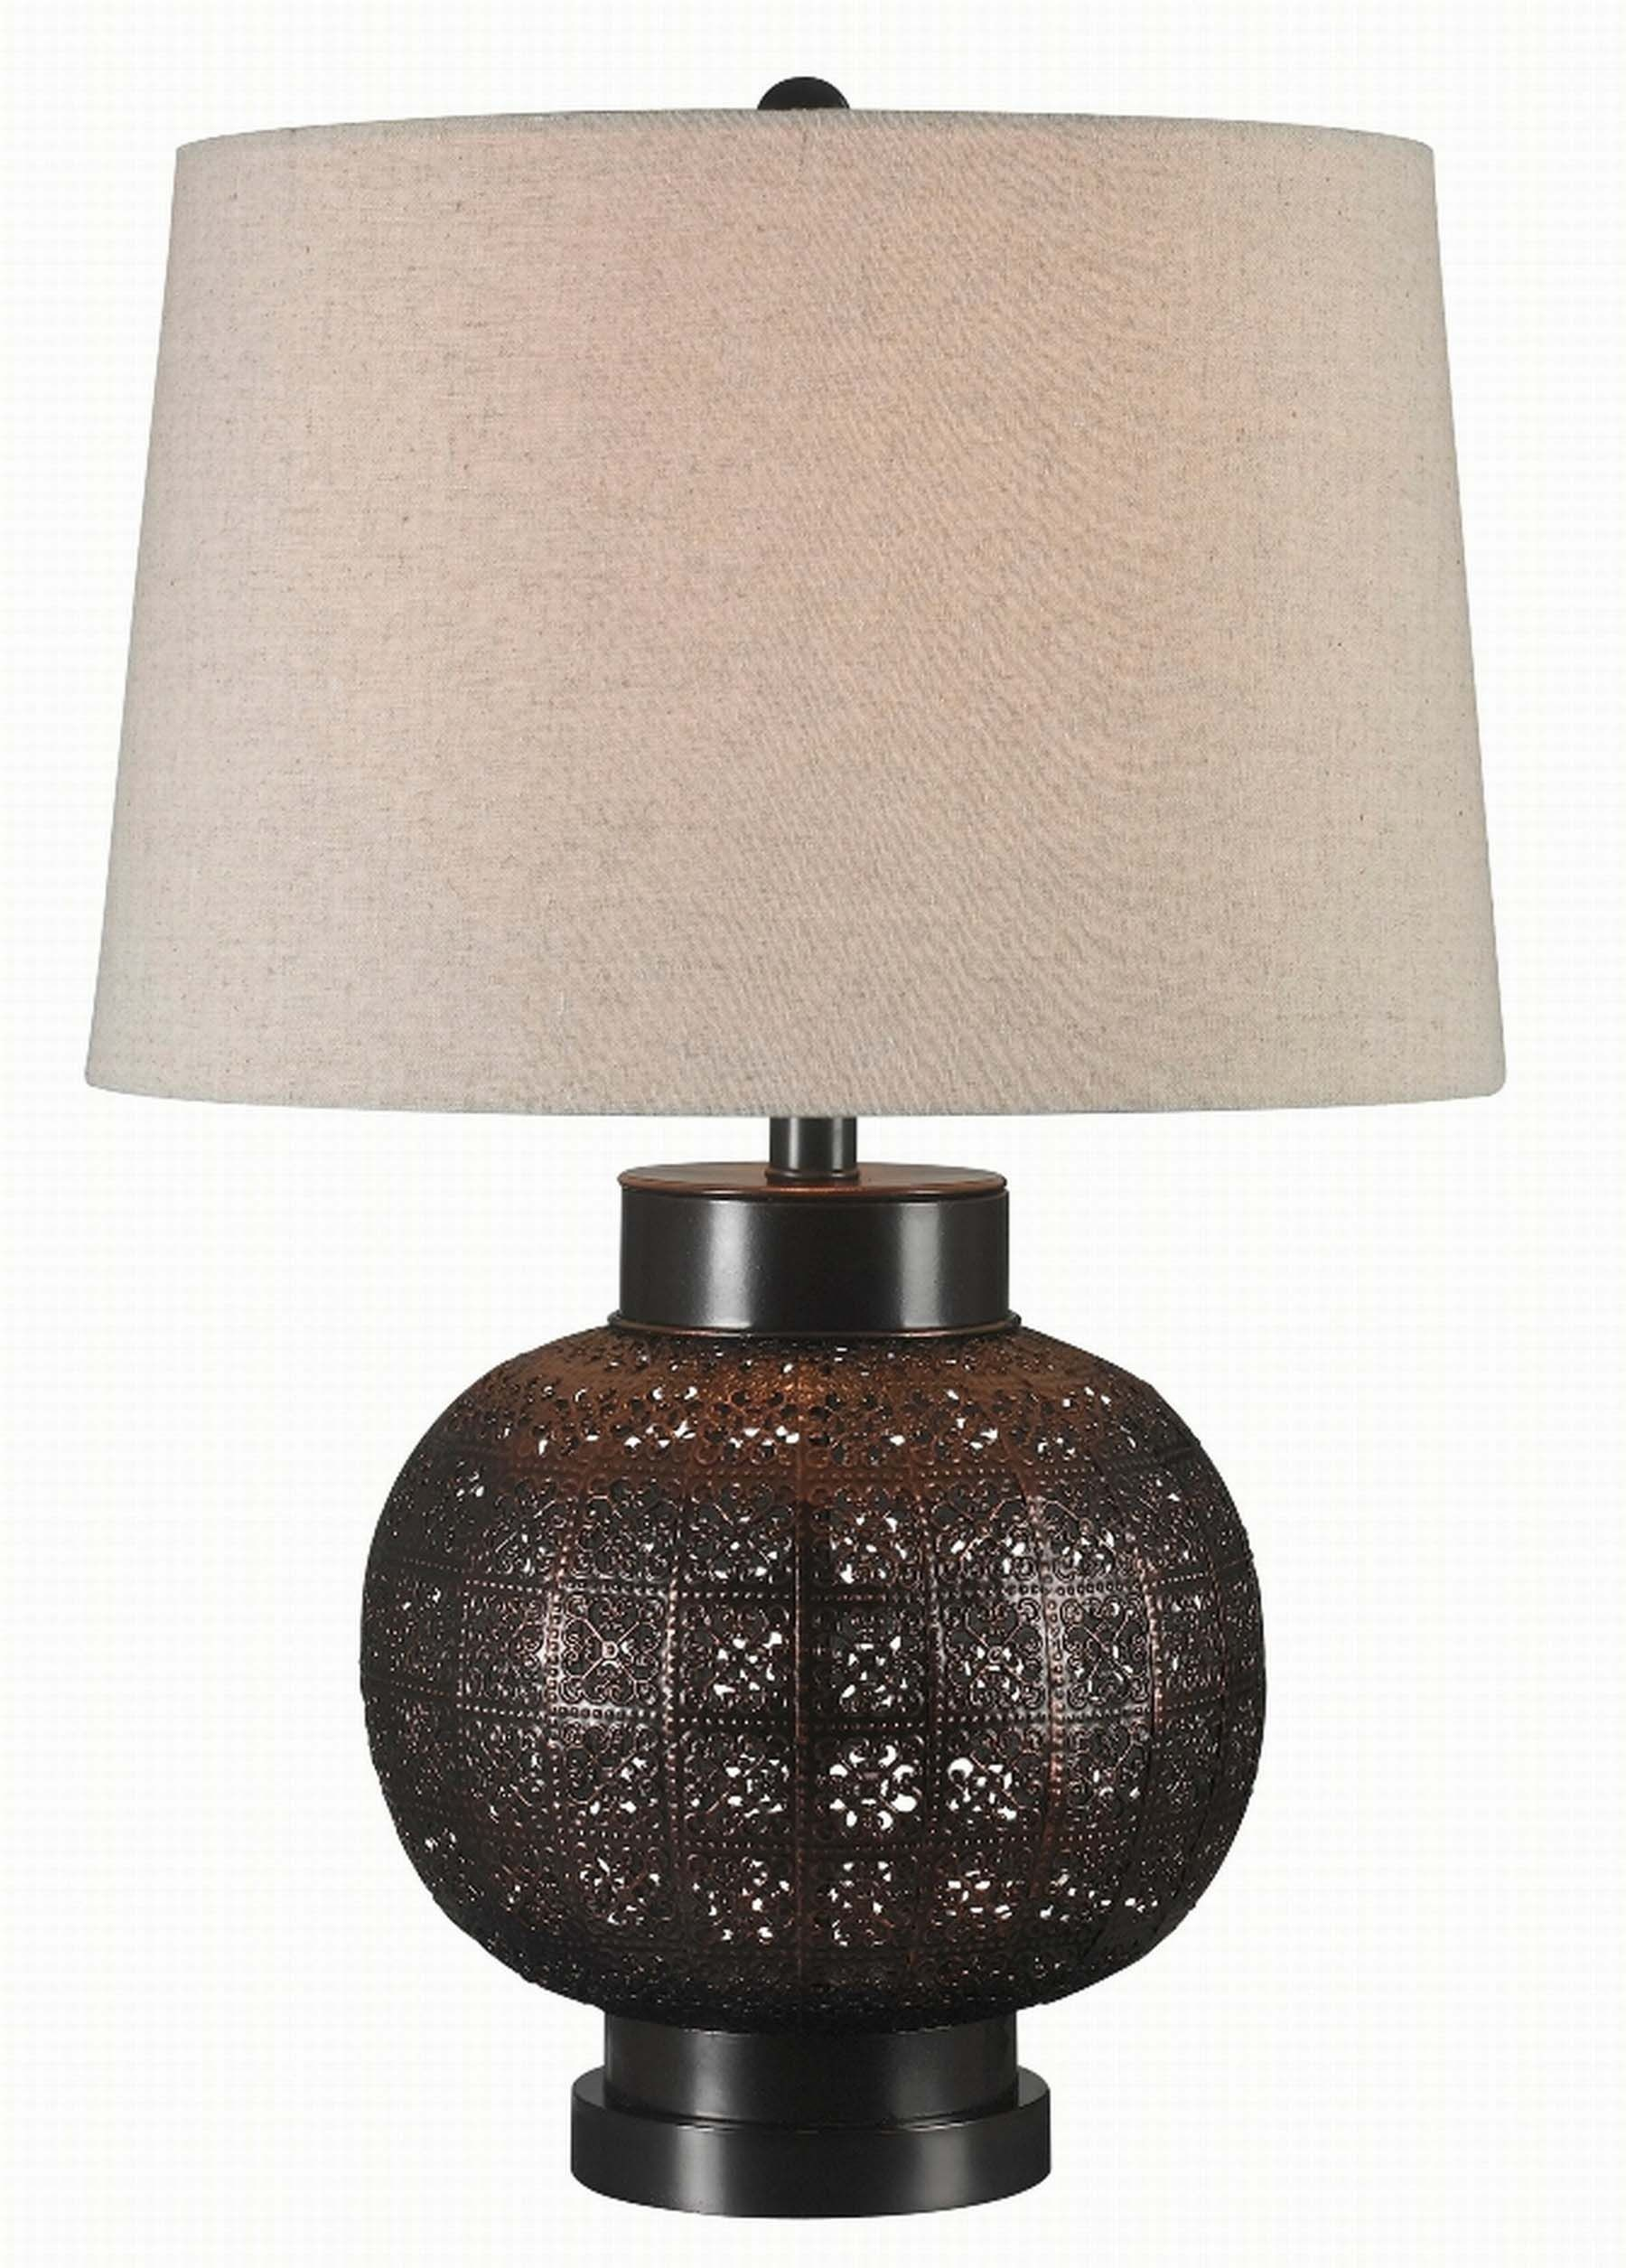 seville oil rubbed bronze table lamp from kenroy 32163orb. Black Bedroom Furniture Sets. Home Design Ideas